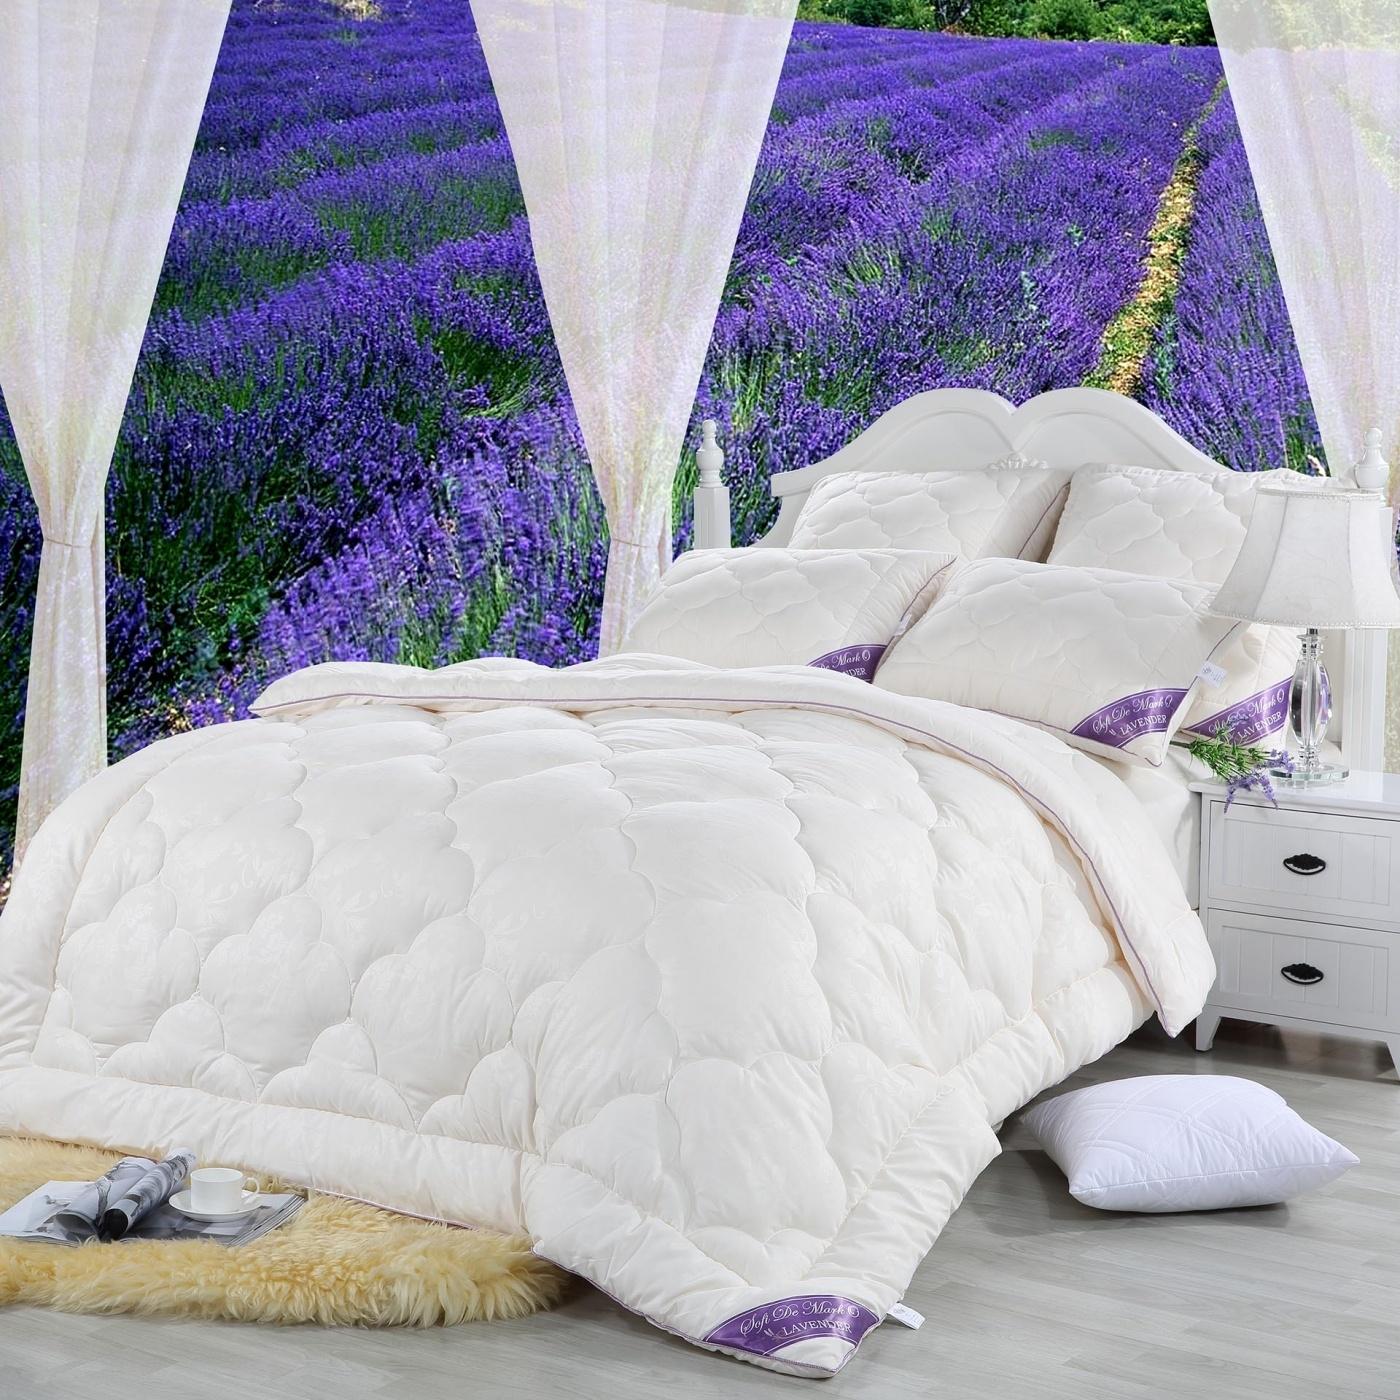 Одеяло Lavanda цвет: белый (195х215 см)